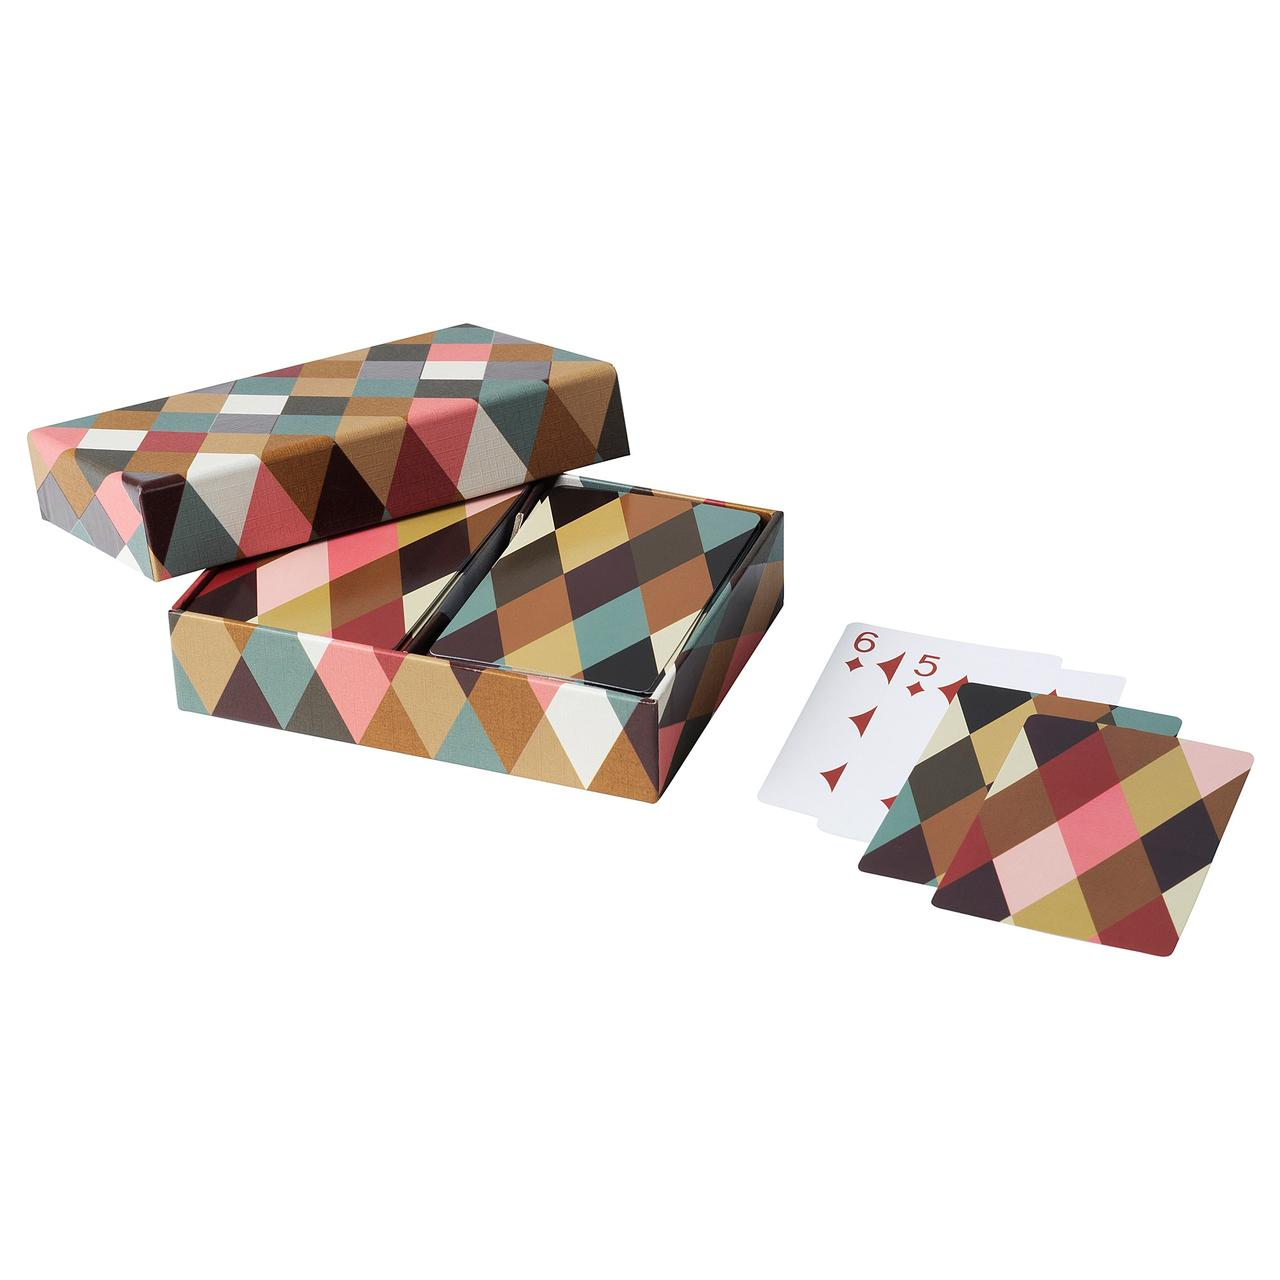 IKEA DEKORERA Карти для гри, шаблон алмазу